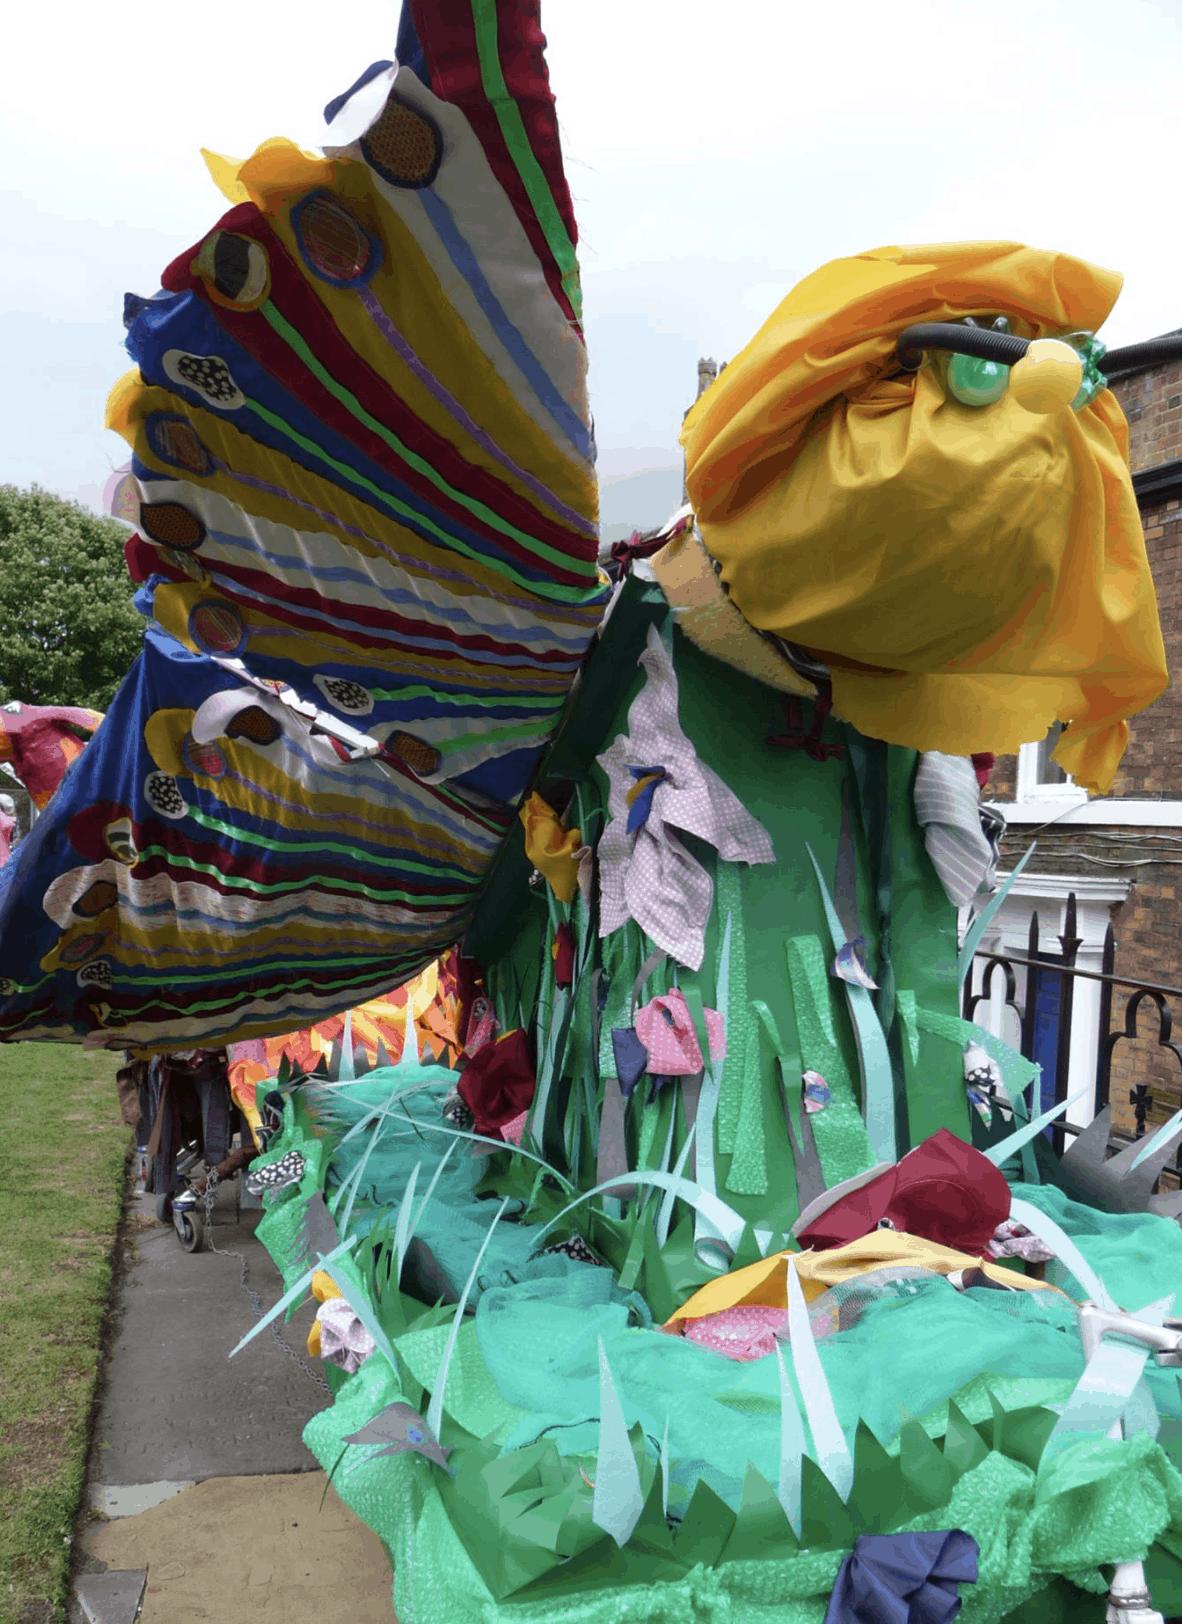 Barnaby Parades past